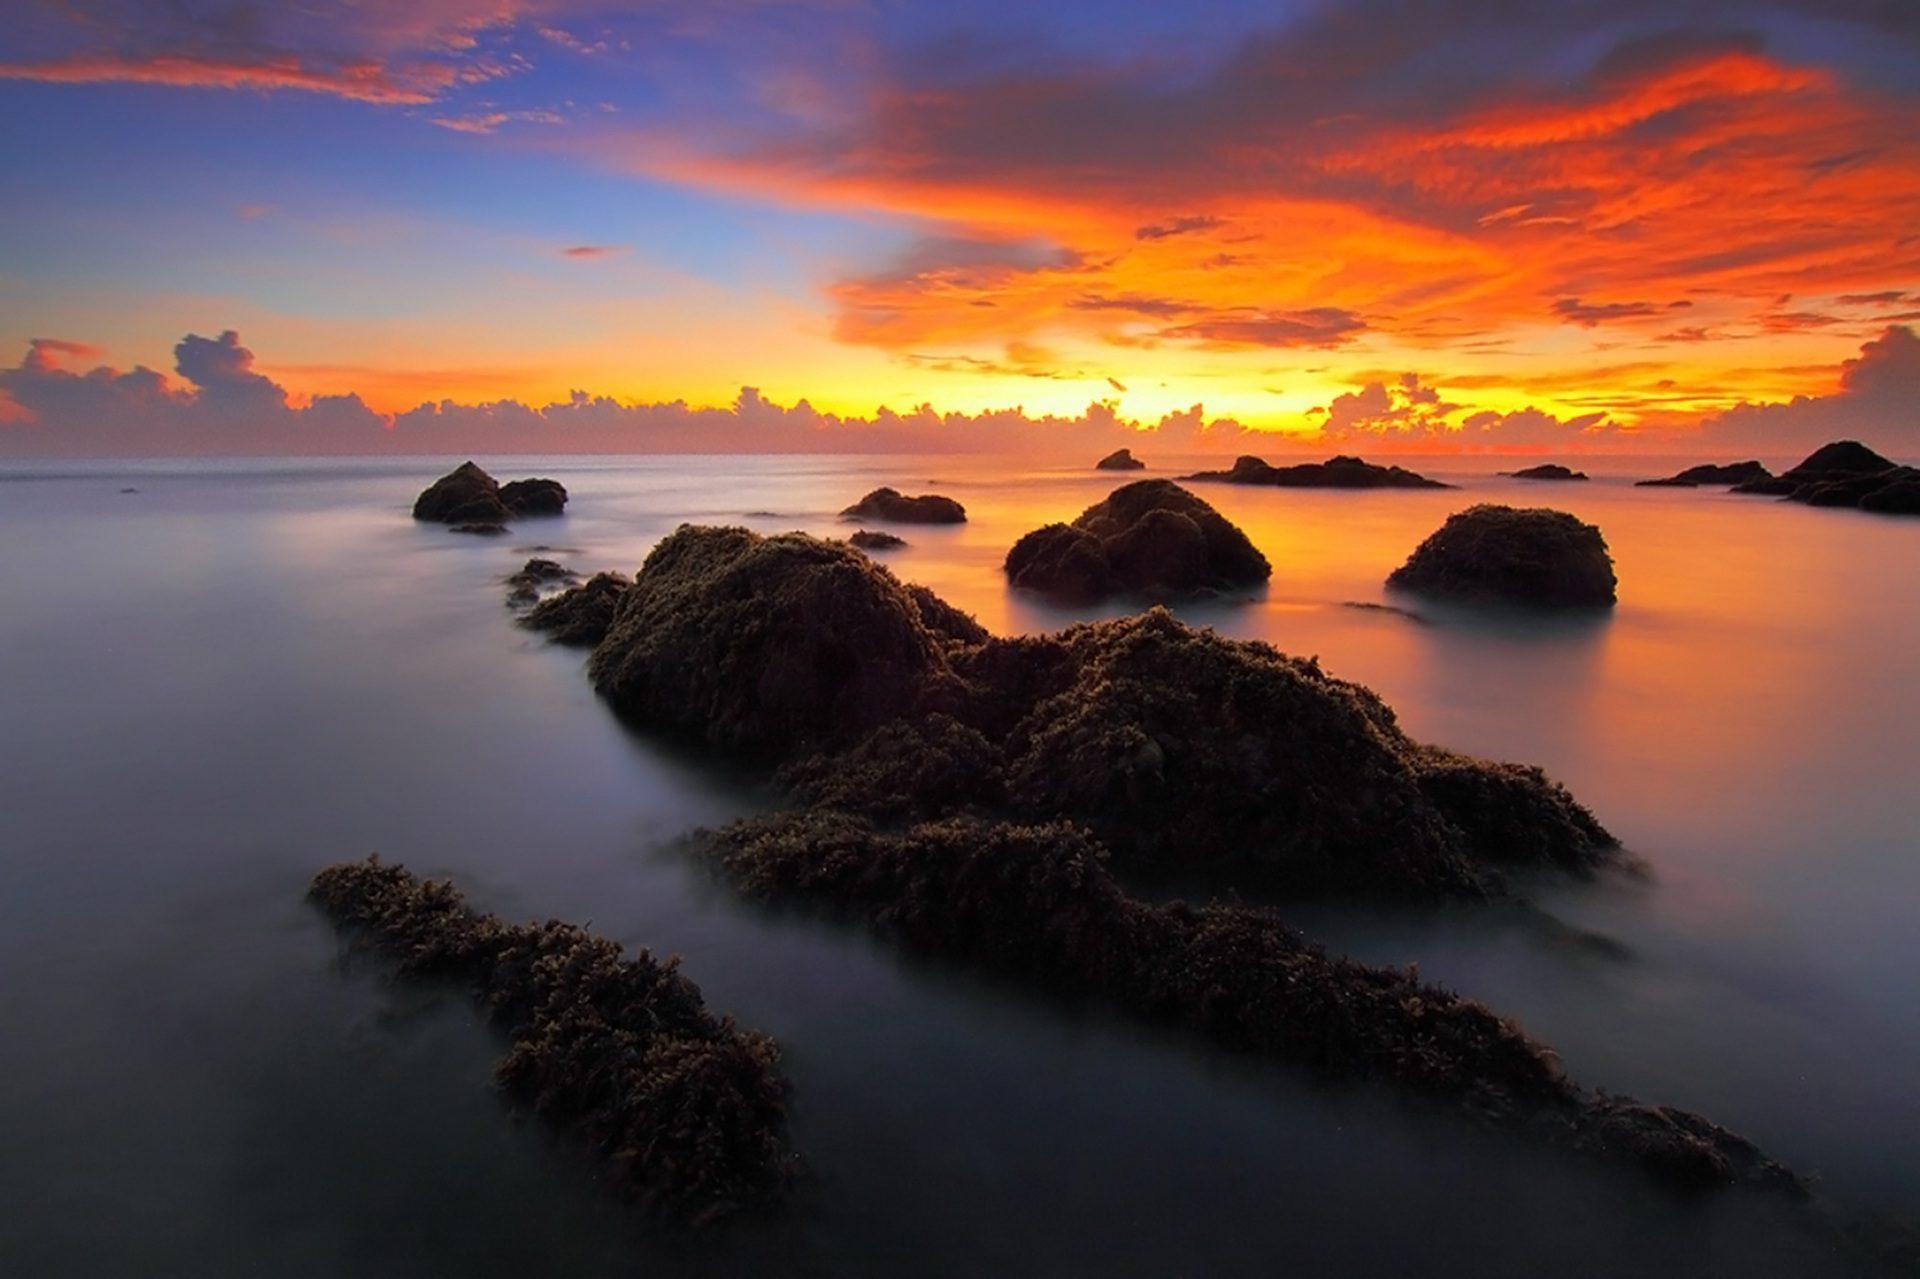 Rocas, lago, Mare, pietre, nebbia, Cielo, Tramonto - Sfondi HD - Professor-falken.com